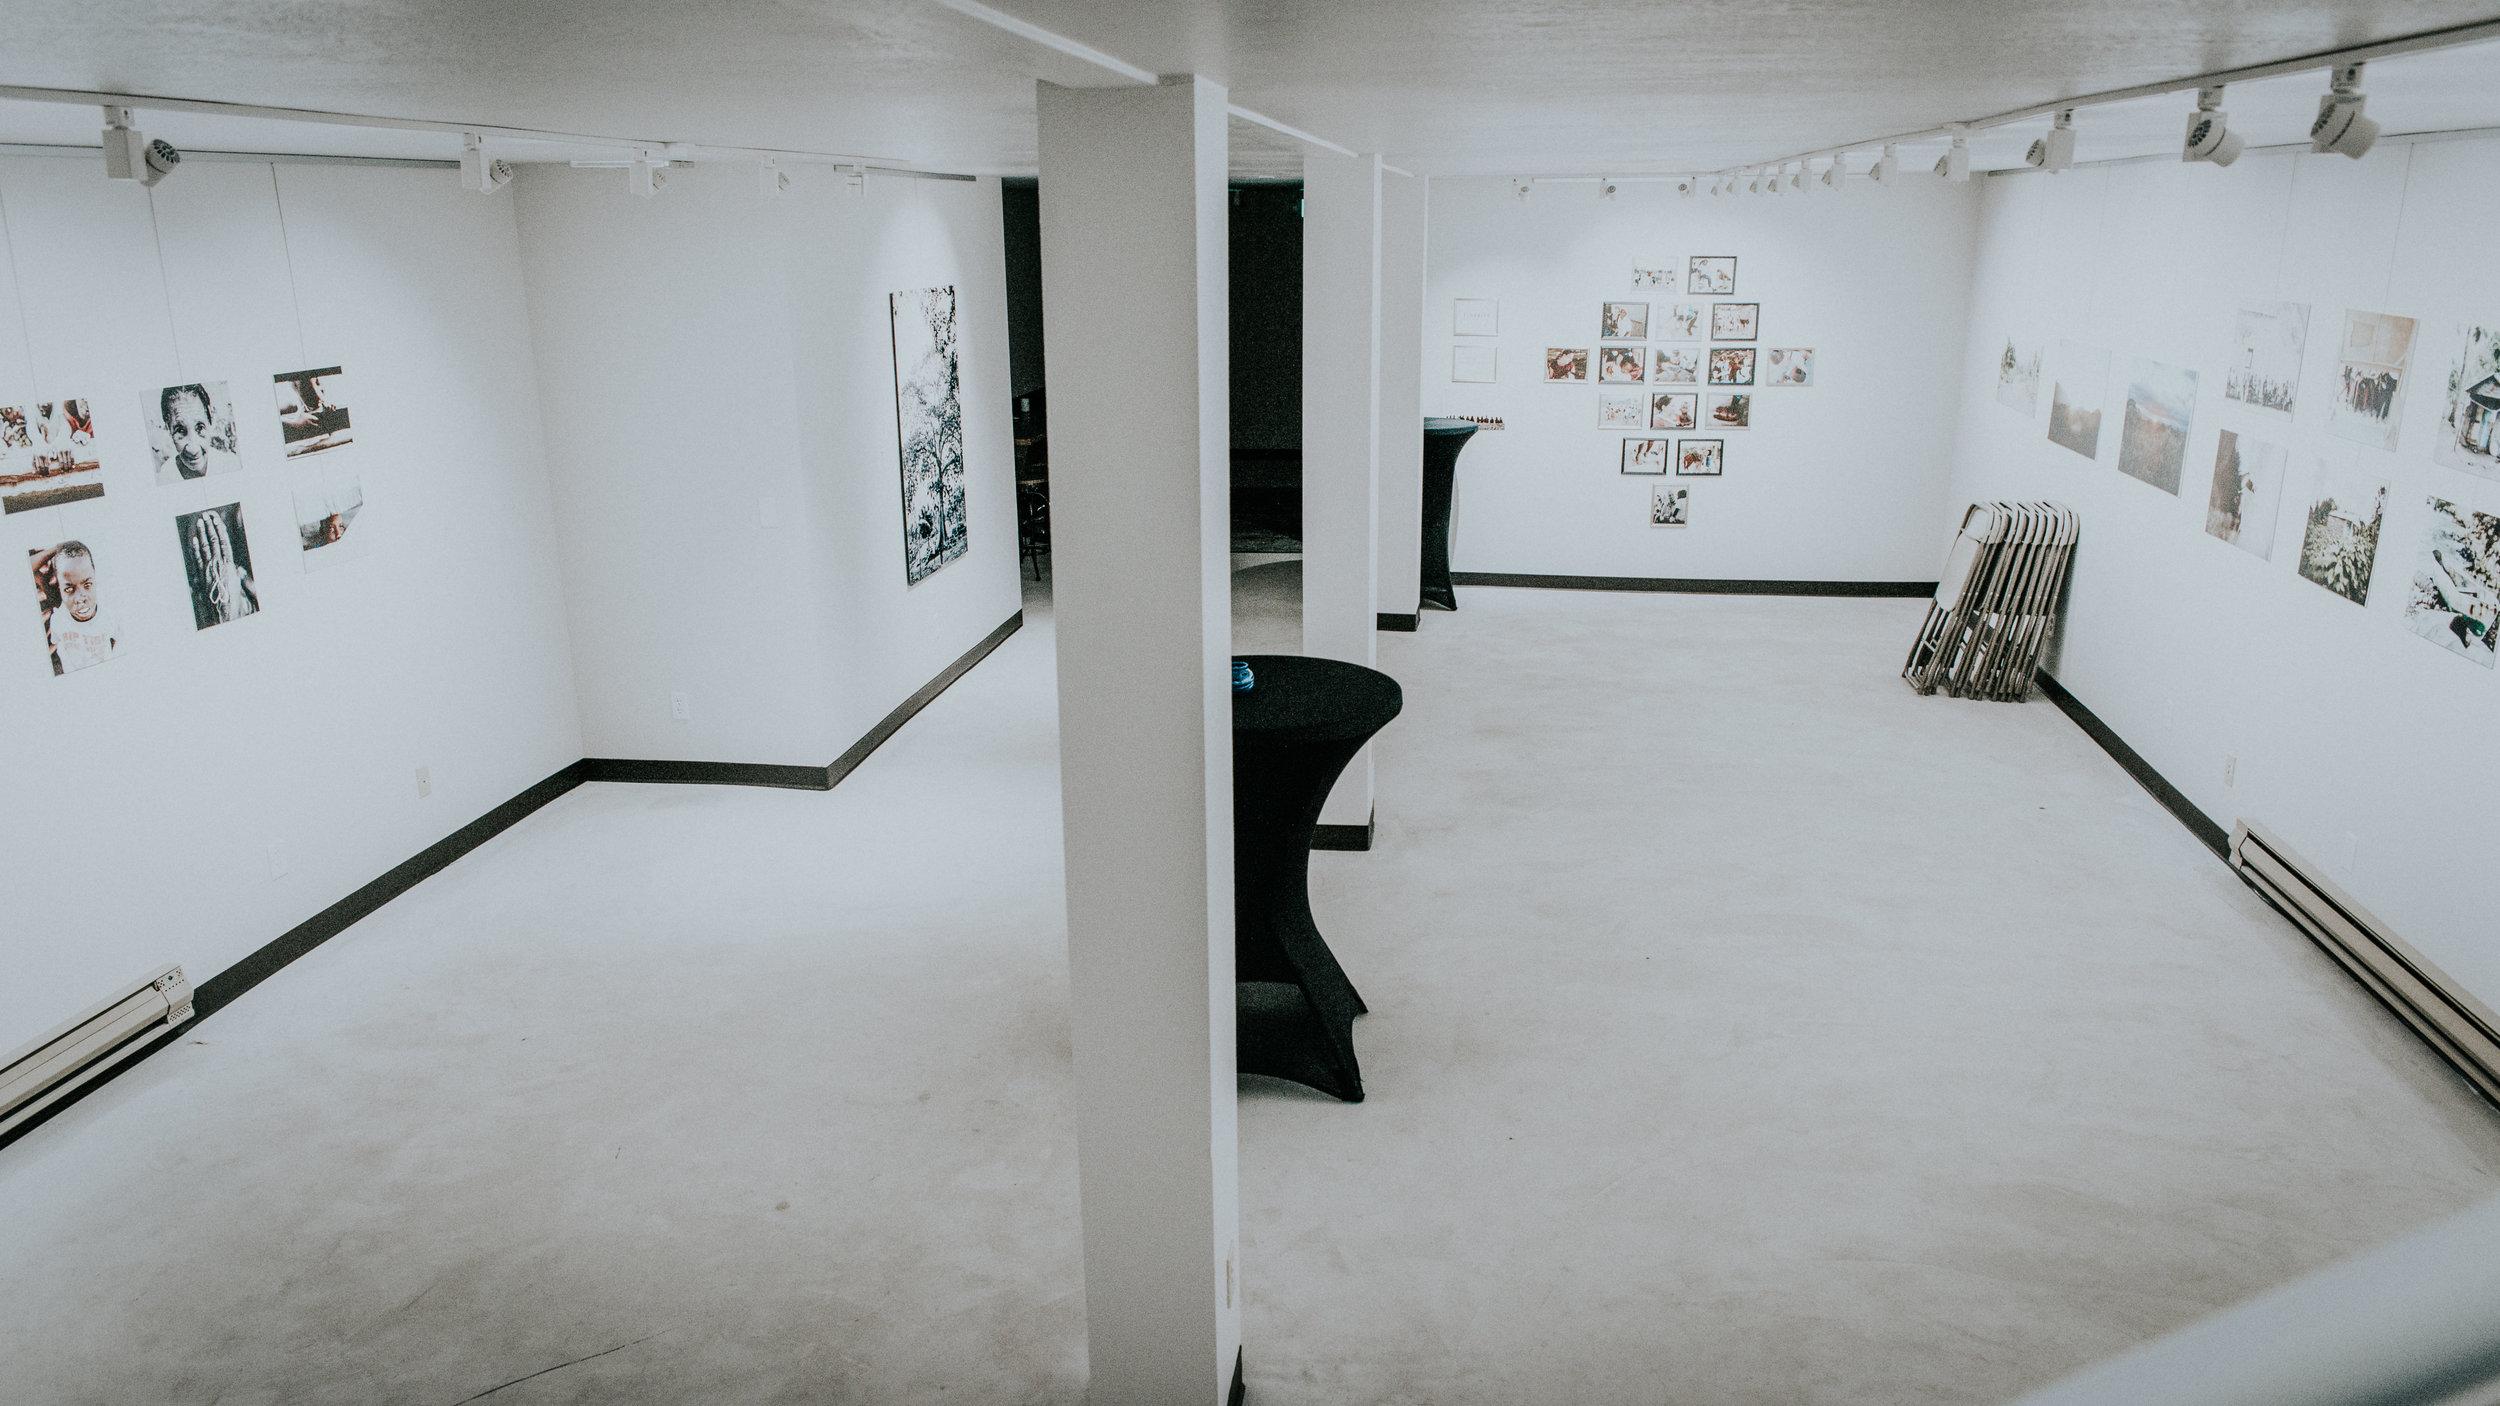 studio boise rental photography idaho-20.jpg